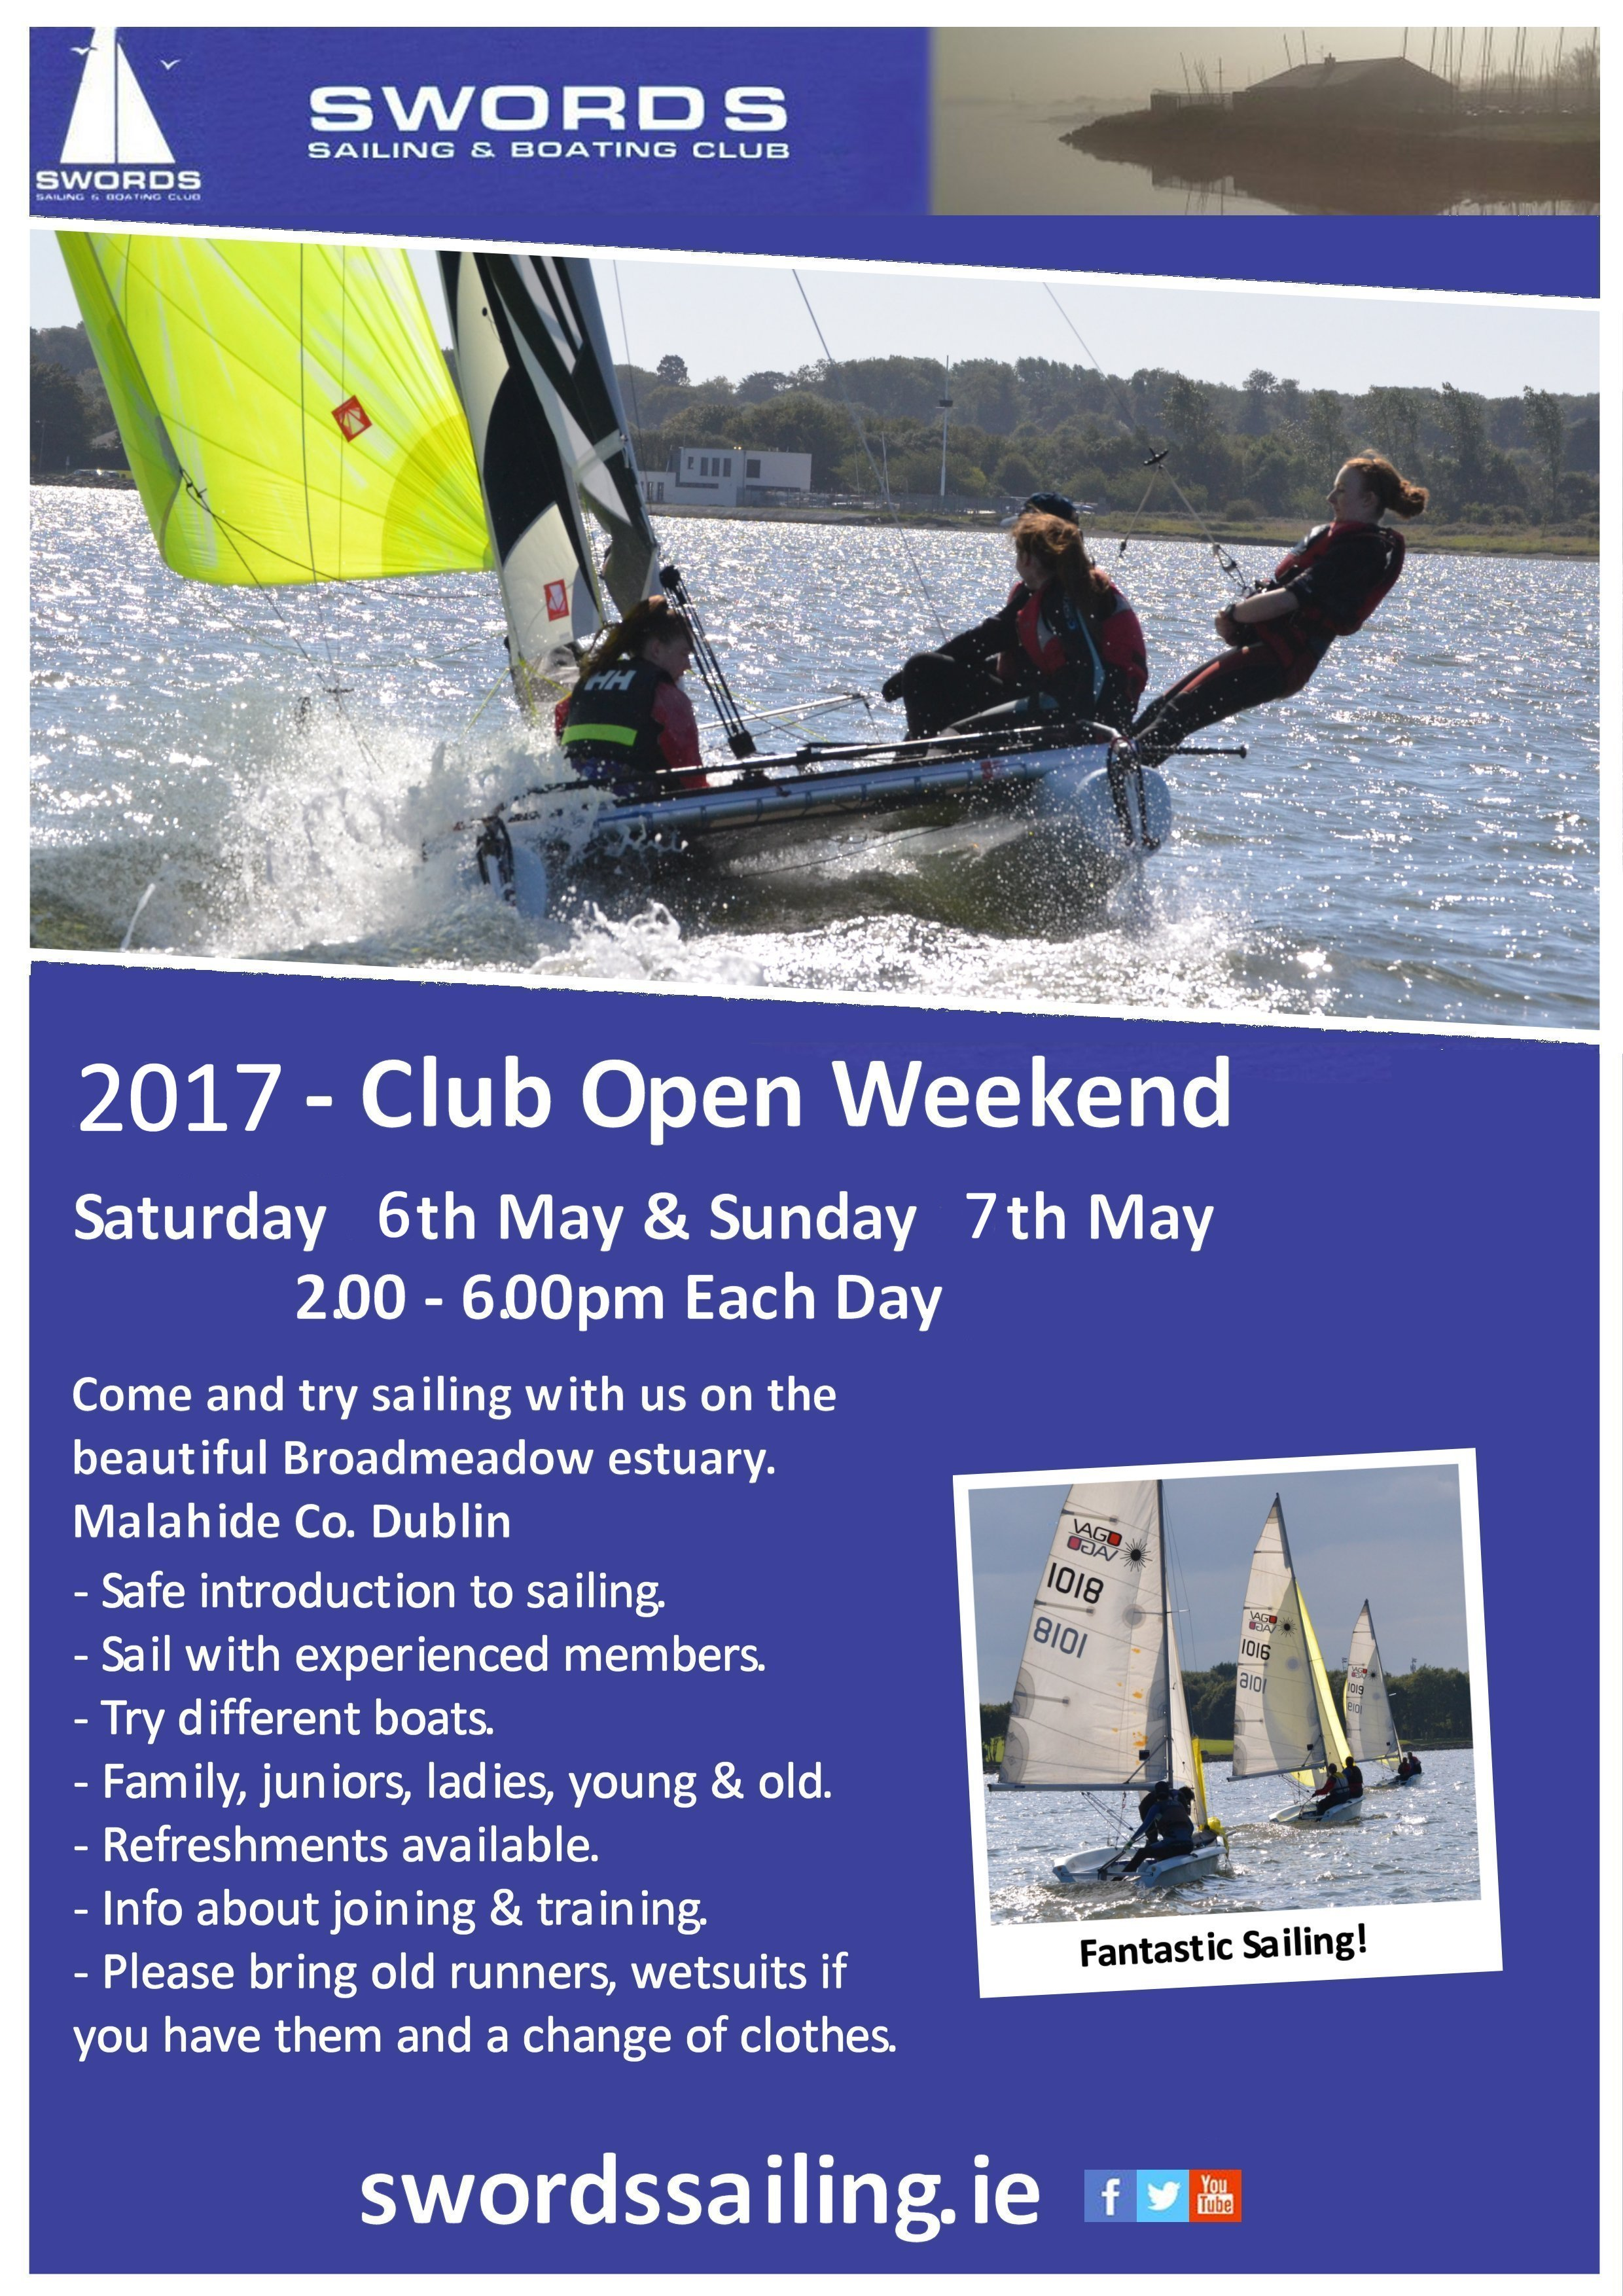 club open weekend swords sailing boating club. Black Bedroom Furniture Sets. Home Design Ideas